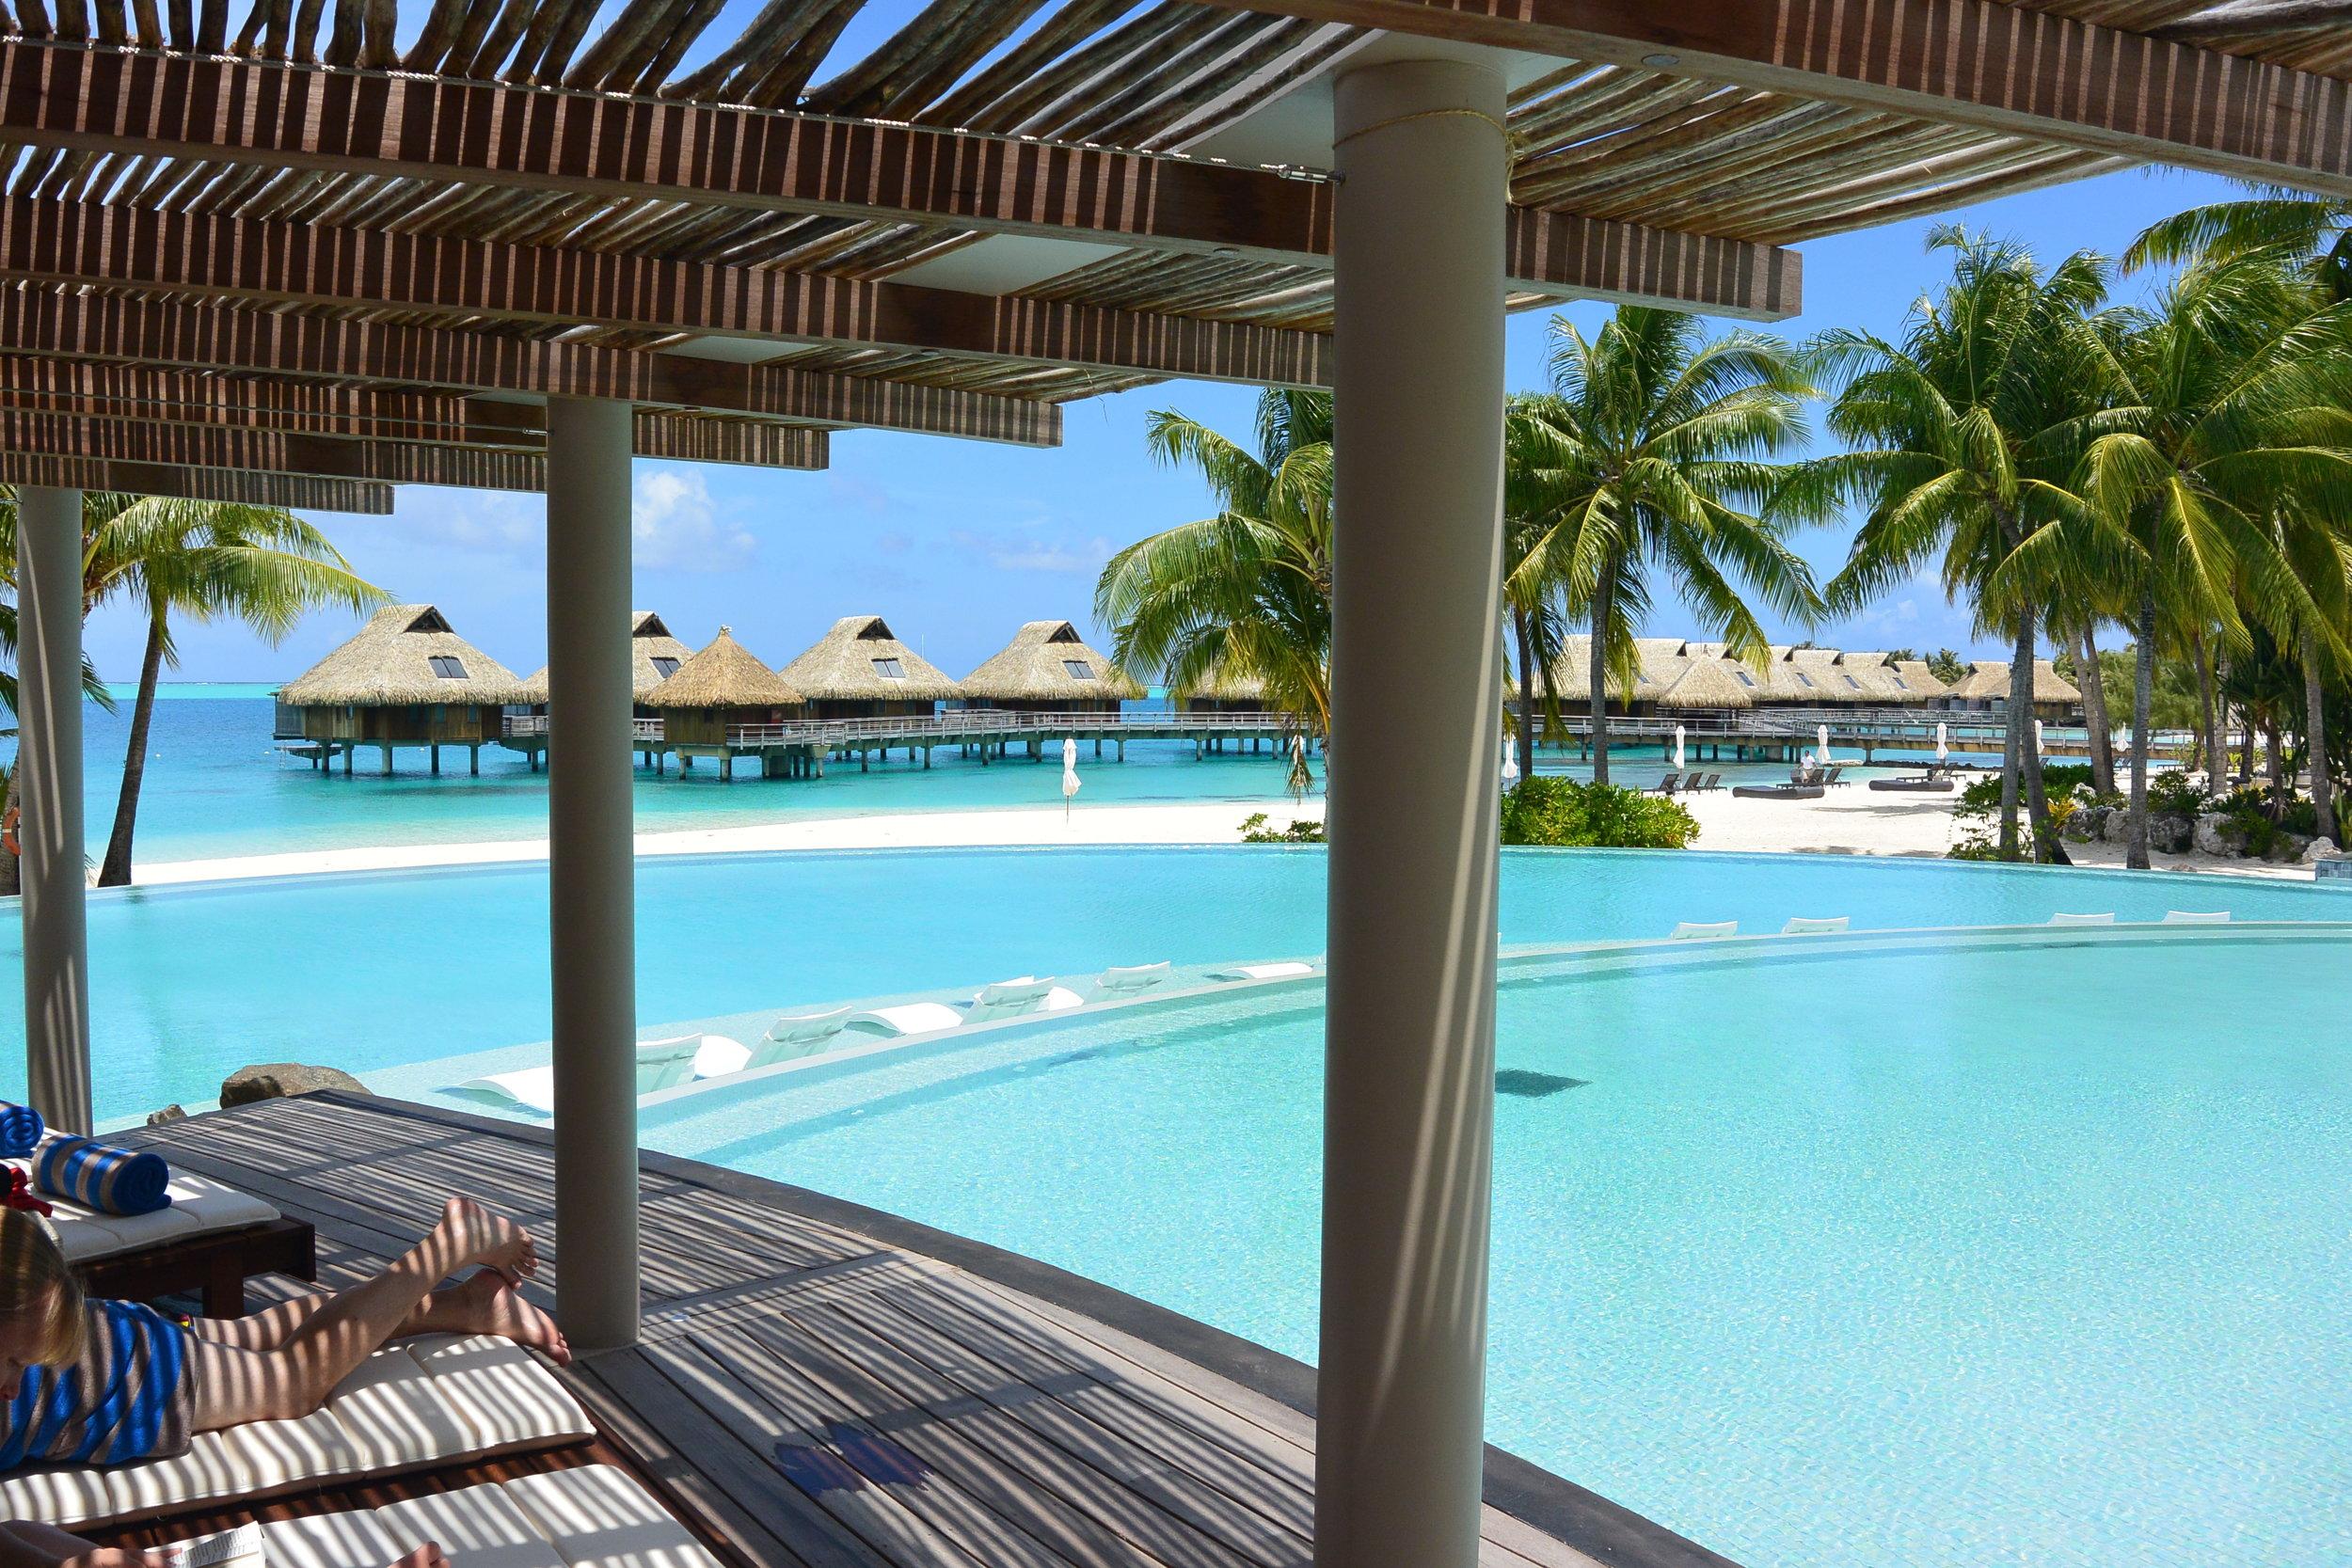 Pool Cabana View.JPG